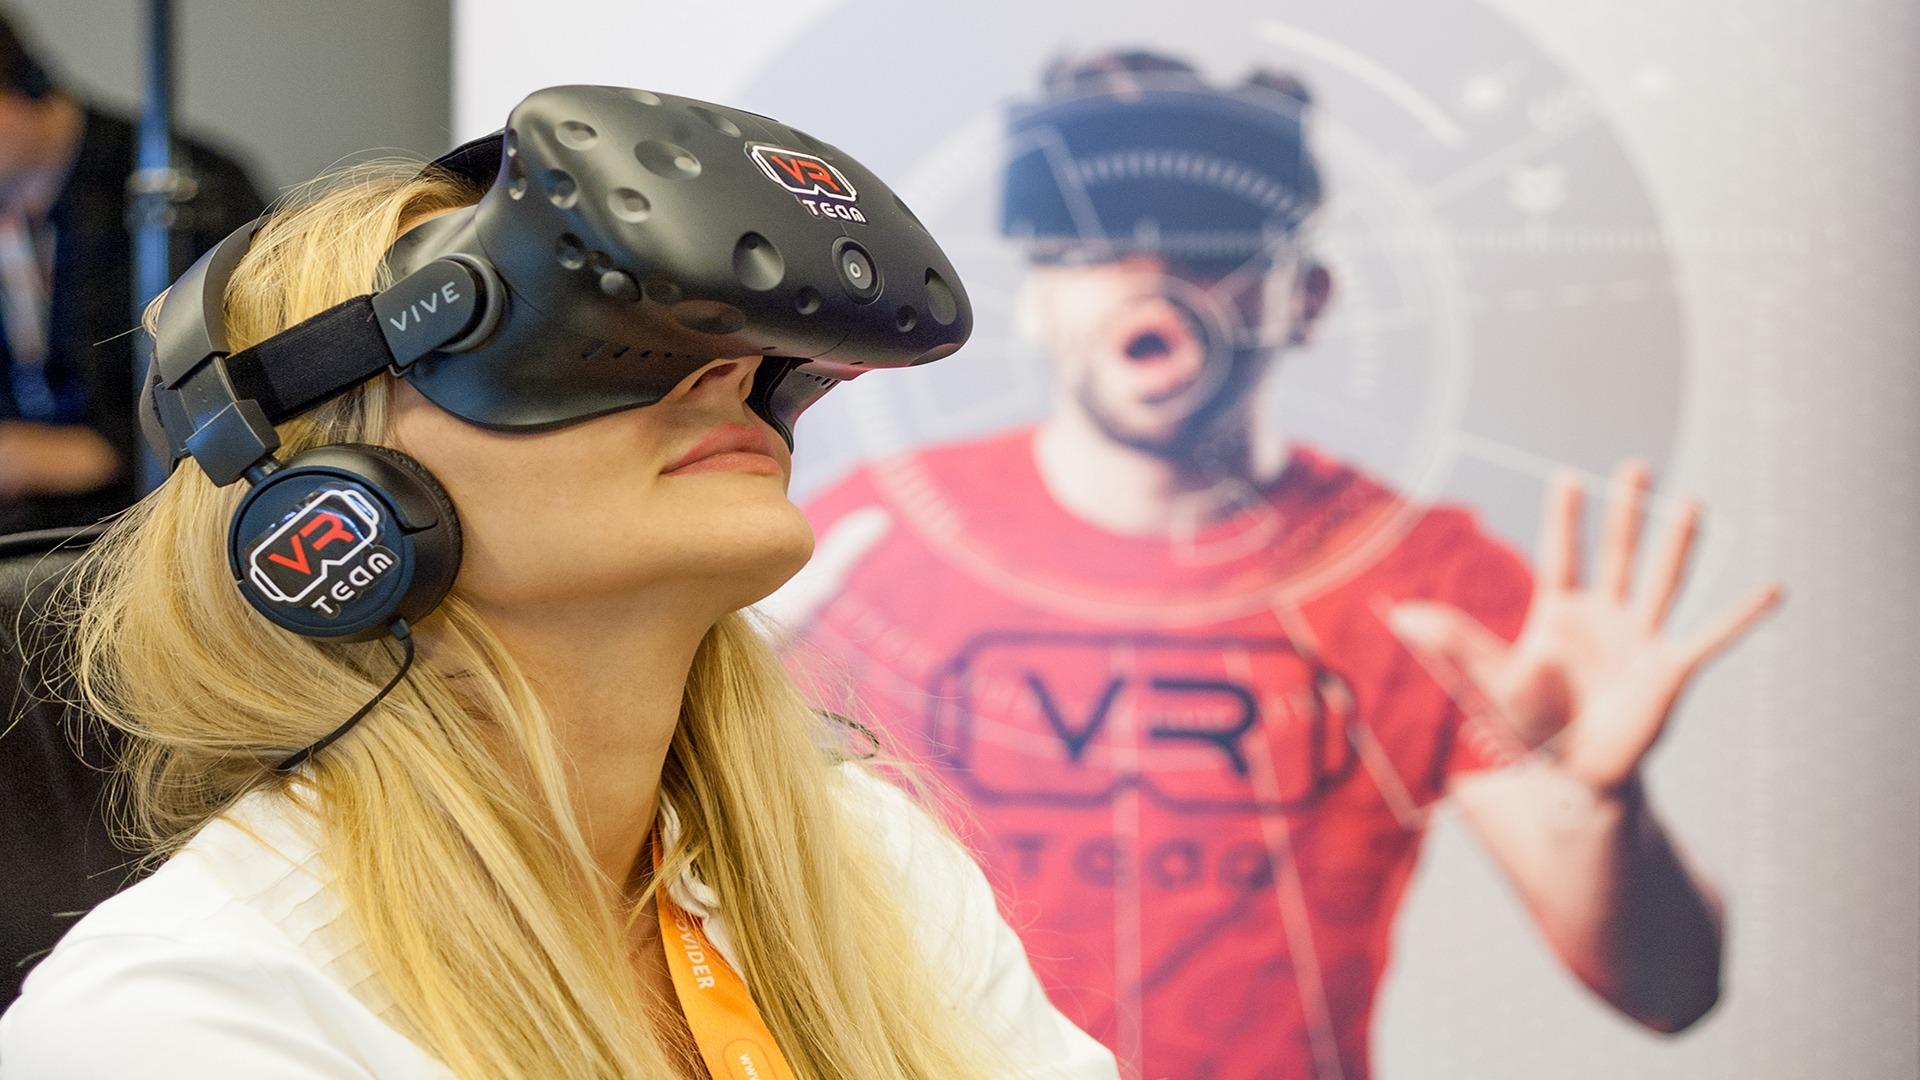 Atrakcje VR wynajem na event